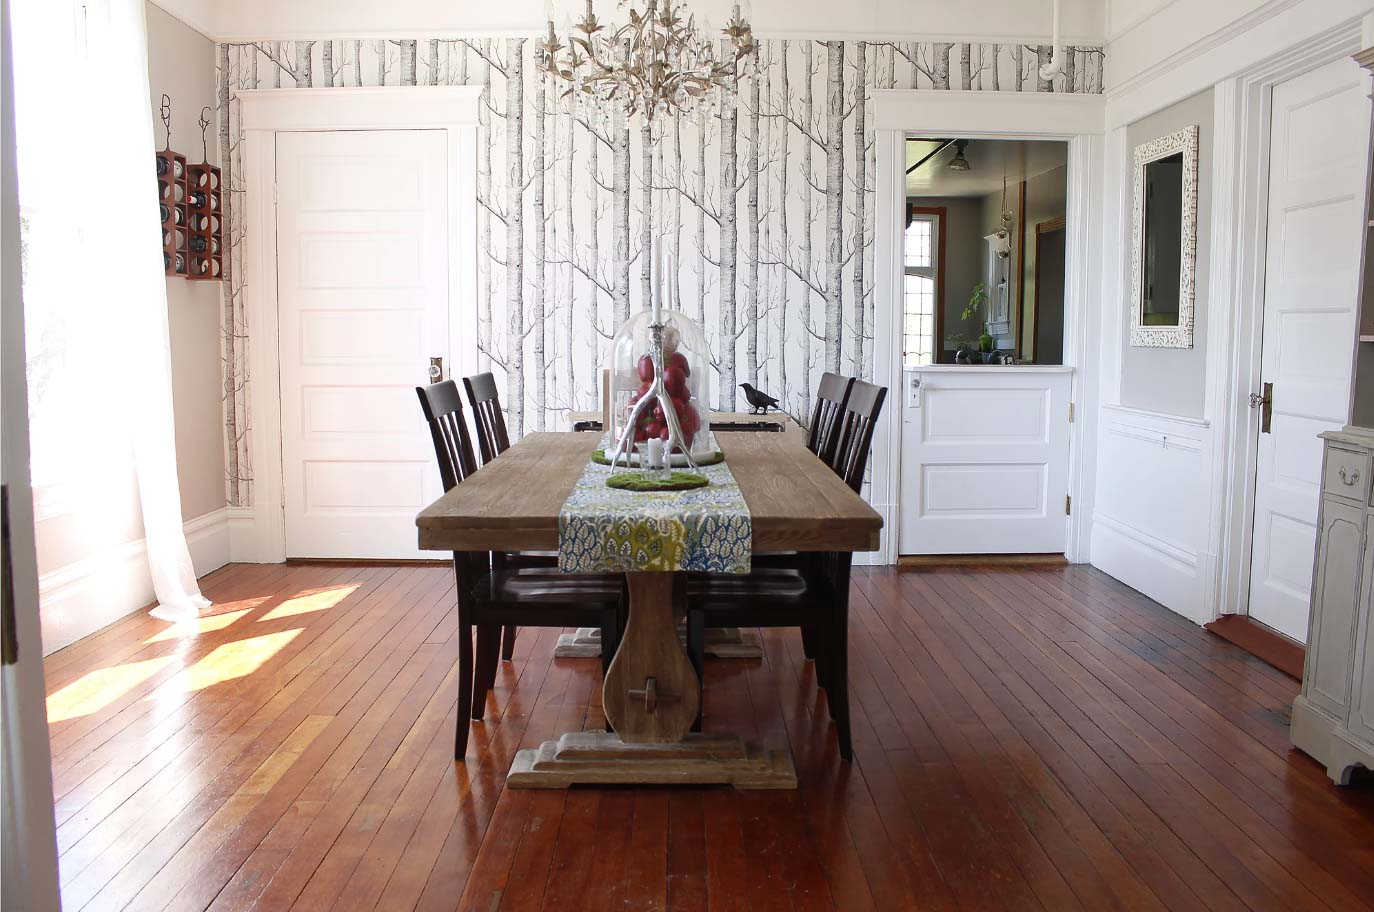 Petaluma-Place-natural-light-photography-studio-lifestyle-photo-ideas-indoor-photoshoot-location-8.jpg